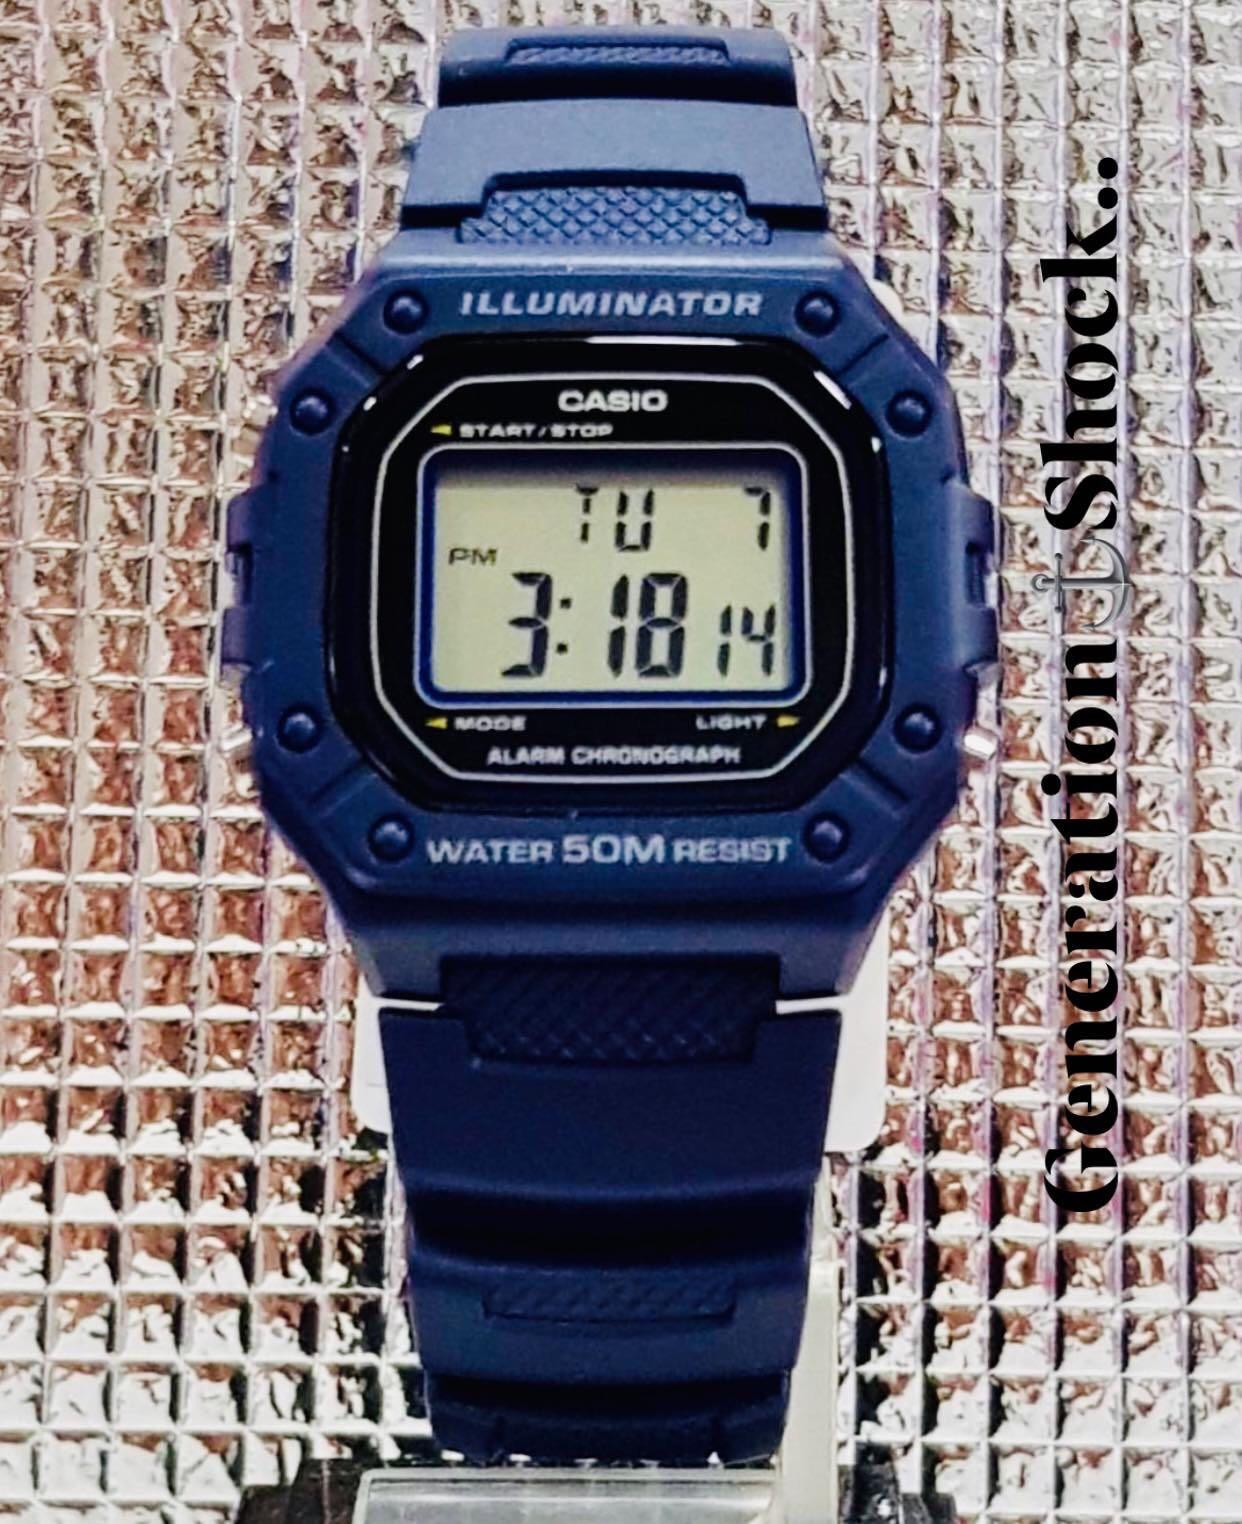 NEW🌟CASIO UNISEX SPORTS WATCH : 100% ORIGINAL AUTHENTIC : By BABY-G-SHOCK ( GSHOCK ) COMPANY : W-218H-2AV (NAVY-BLUE)